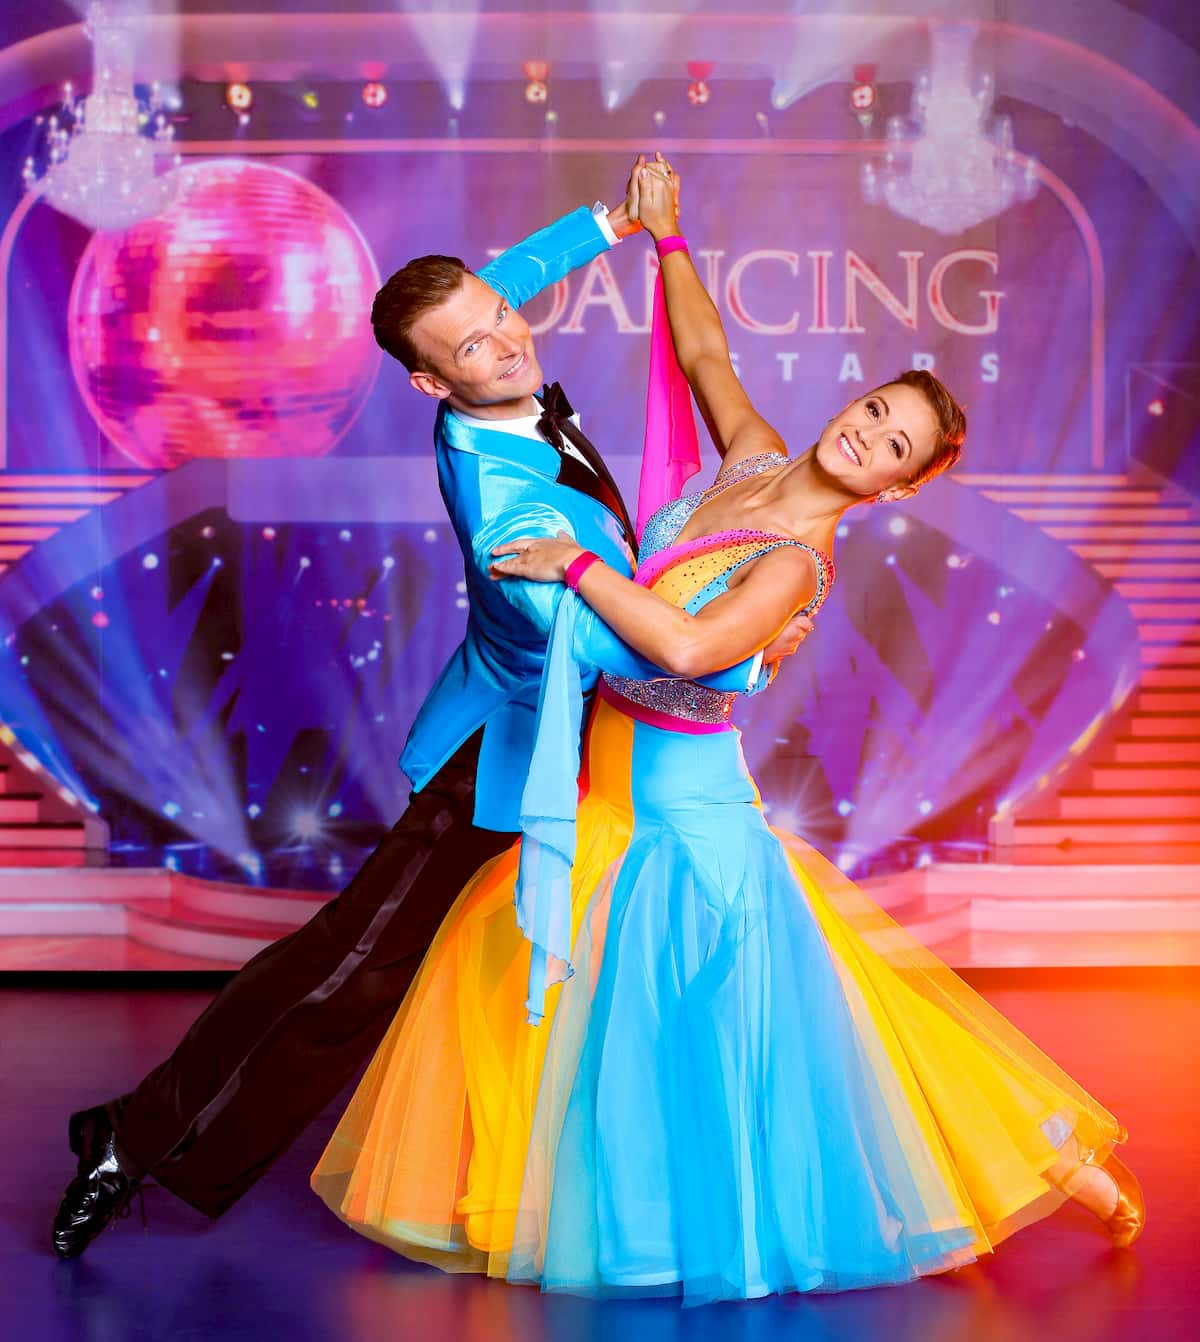 Vadim Garbuzov - Michaela Kirchgasser bei den Dancing Stars am 13.11.2020